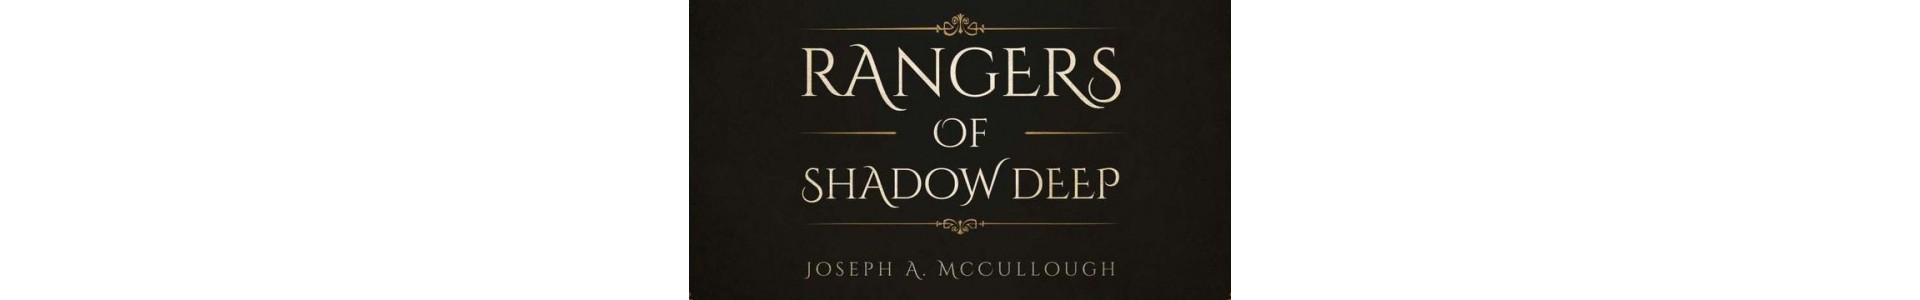 Rangers of Shadow Deep - Jeux de Figurine | Acheter sur Starplayer